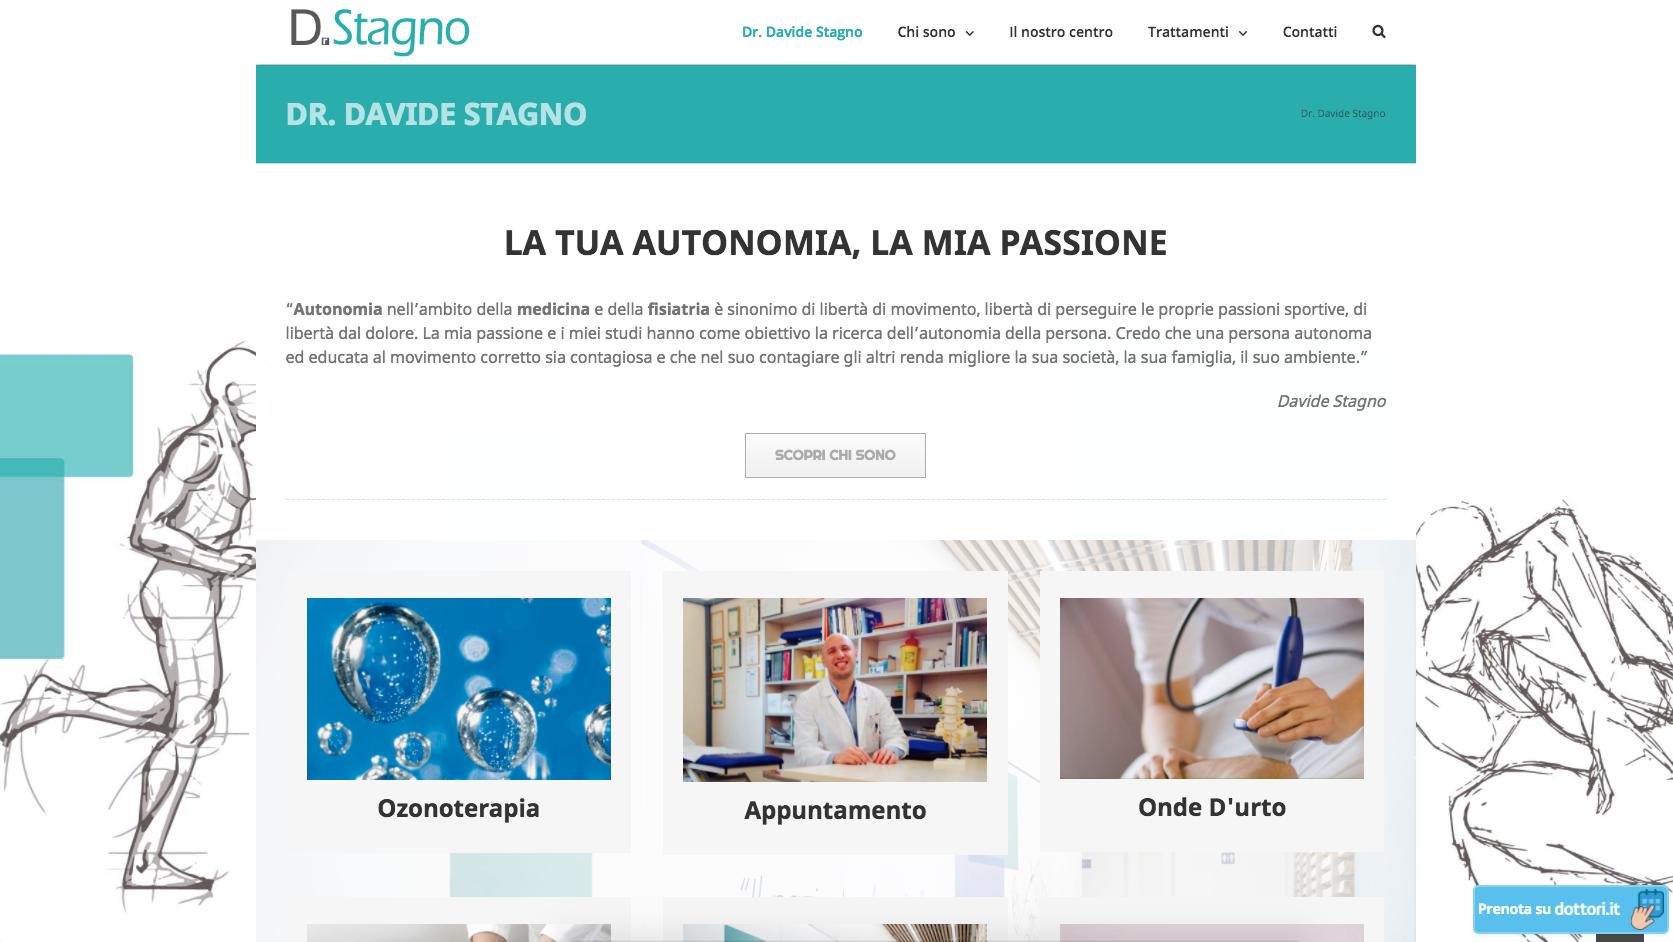 Dr. Davide Stagno